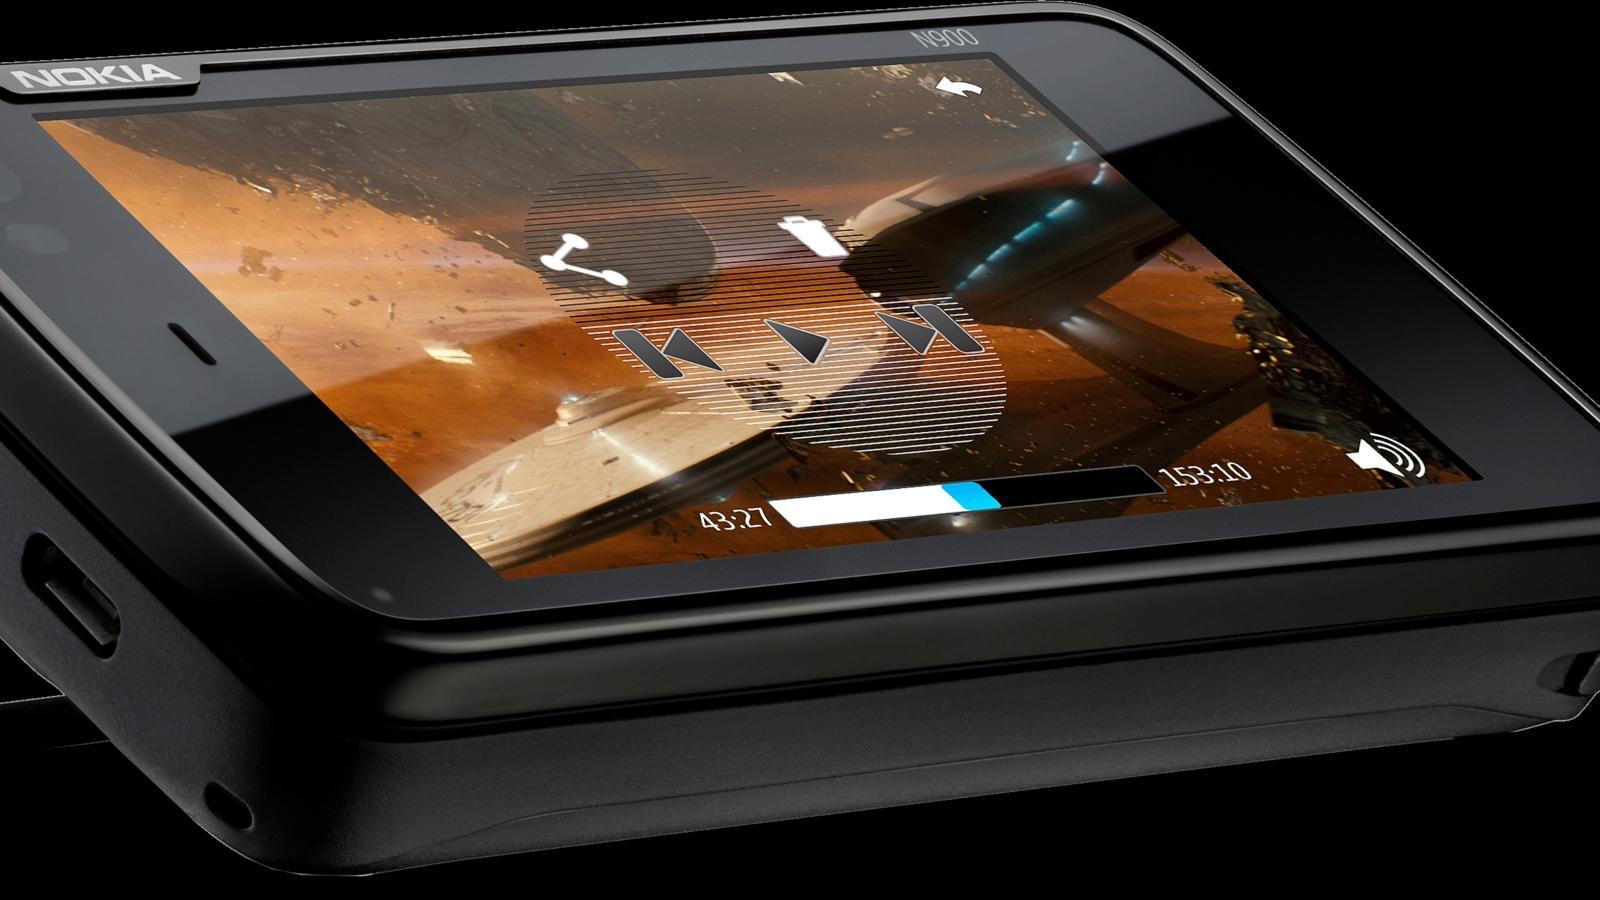 N950 kan bli Nokias første MeeGo-mobil